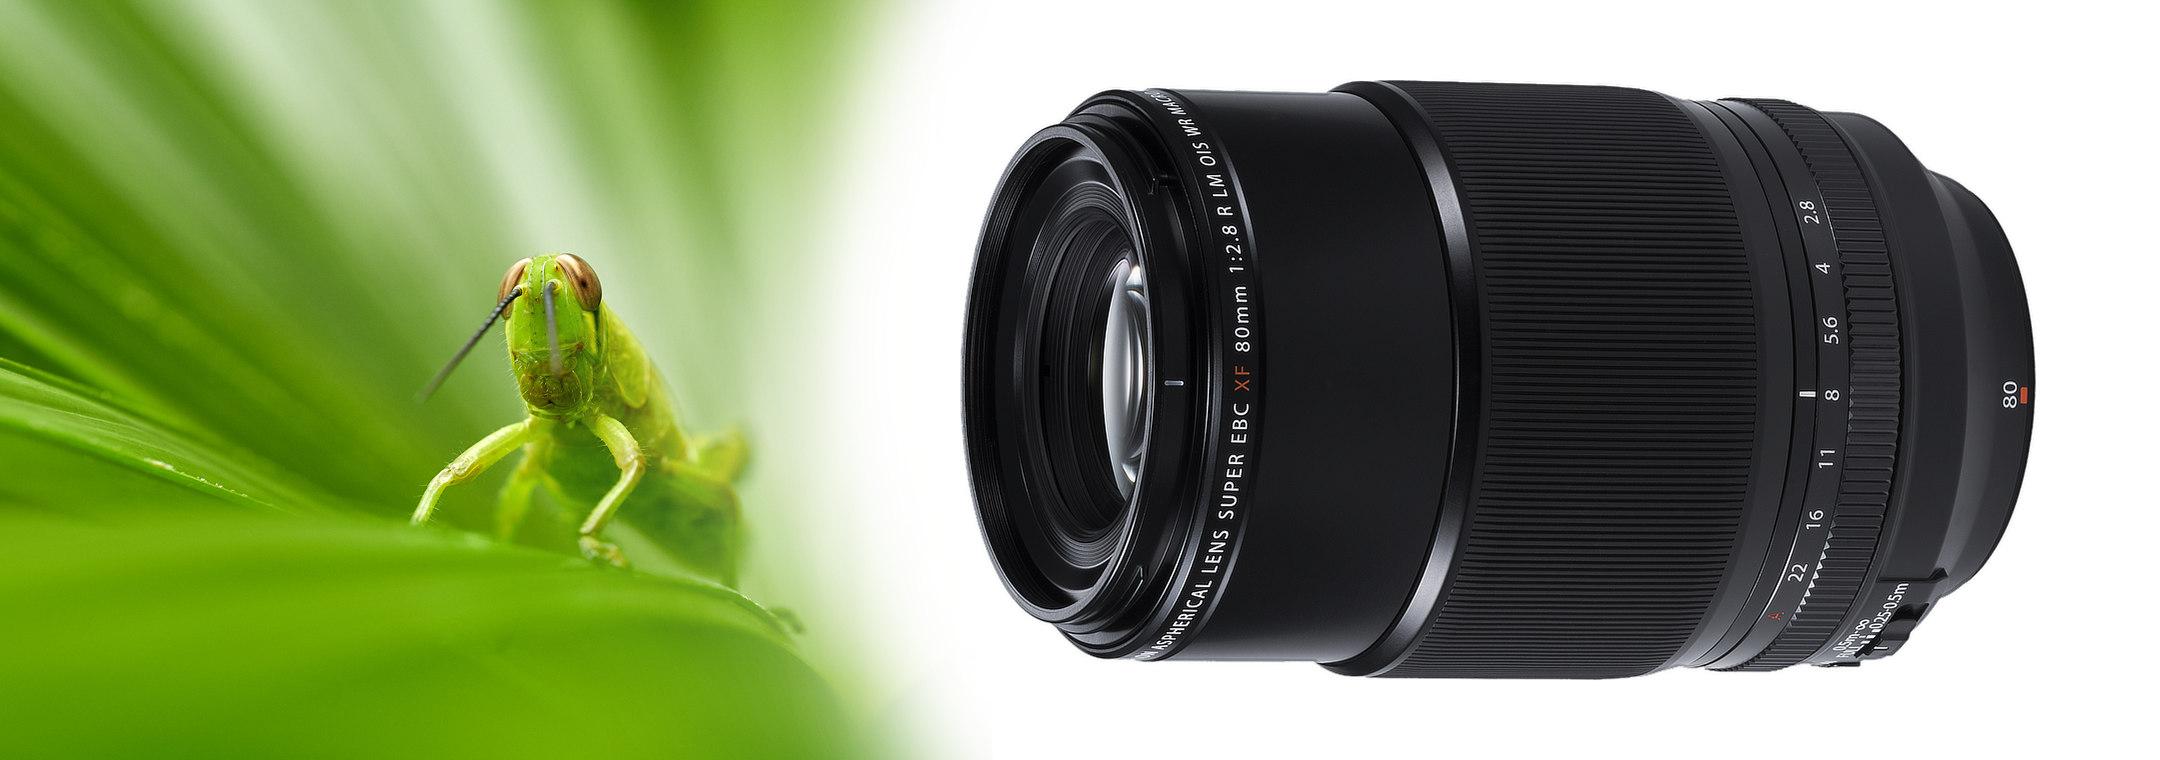 My experience with Fujifilm XF80mmF2 8 Macro lens – Michal